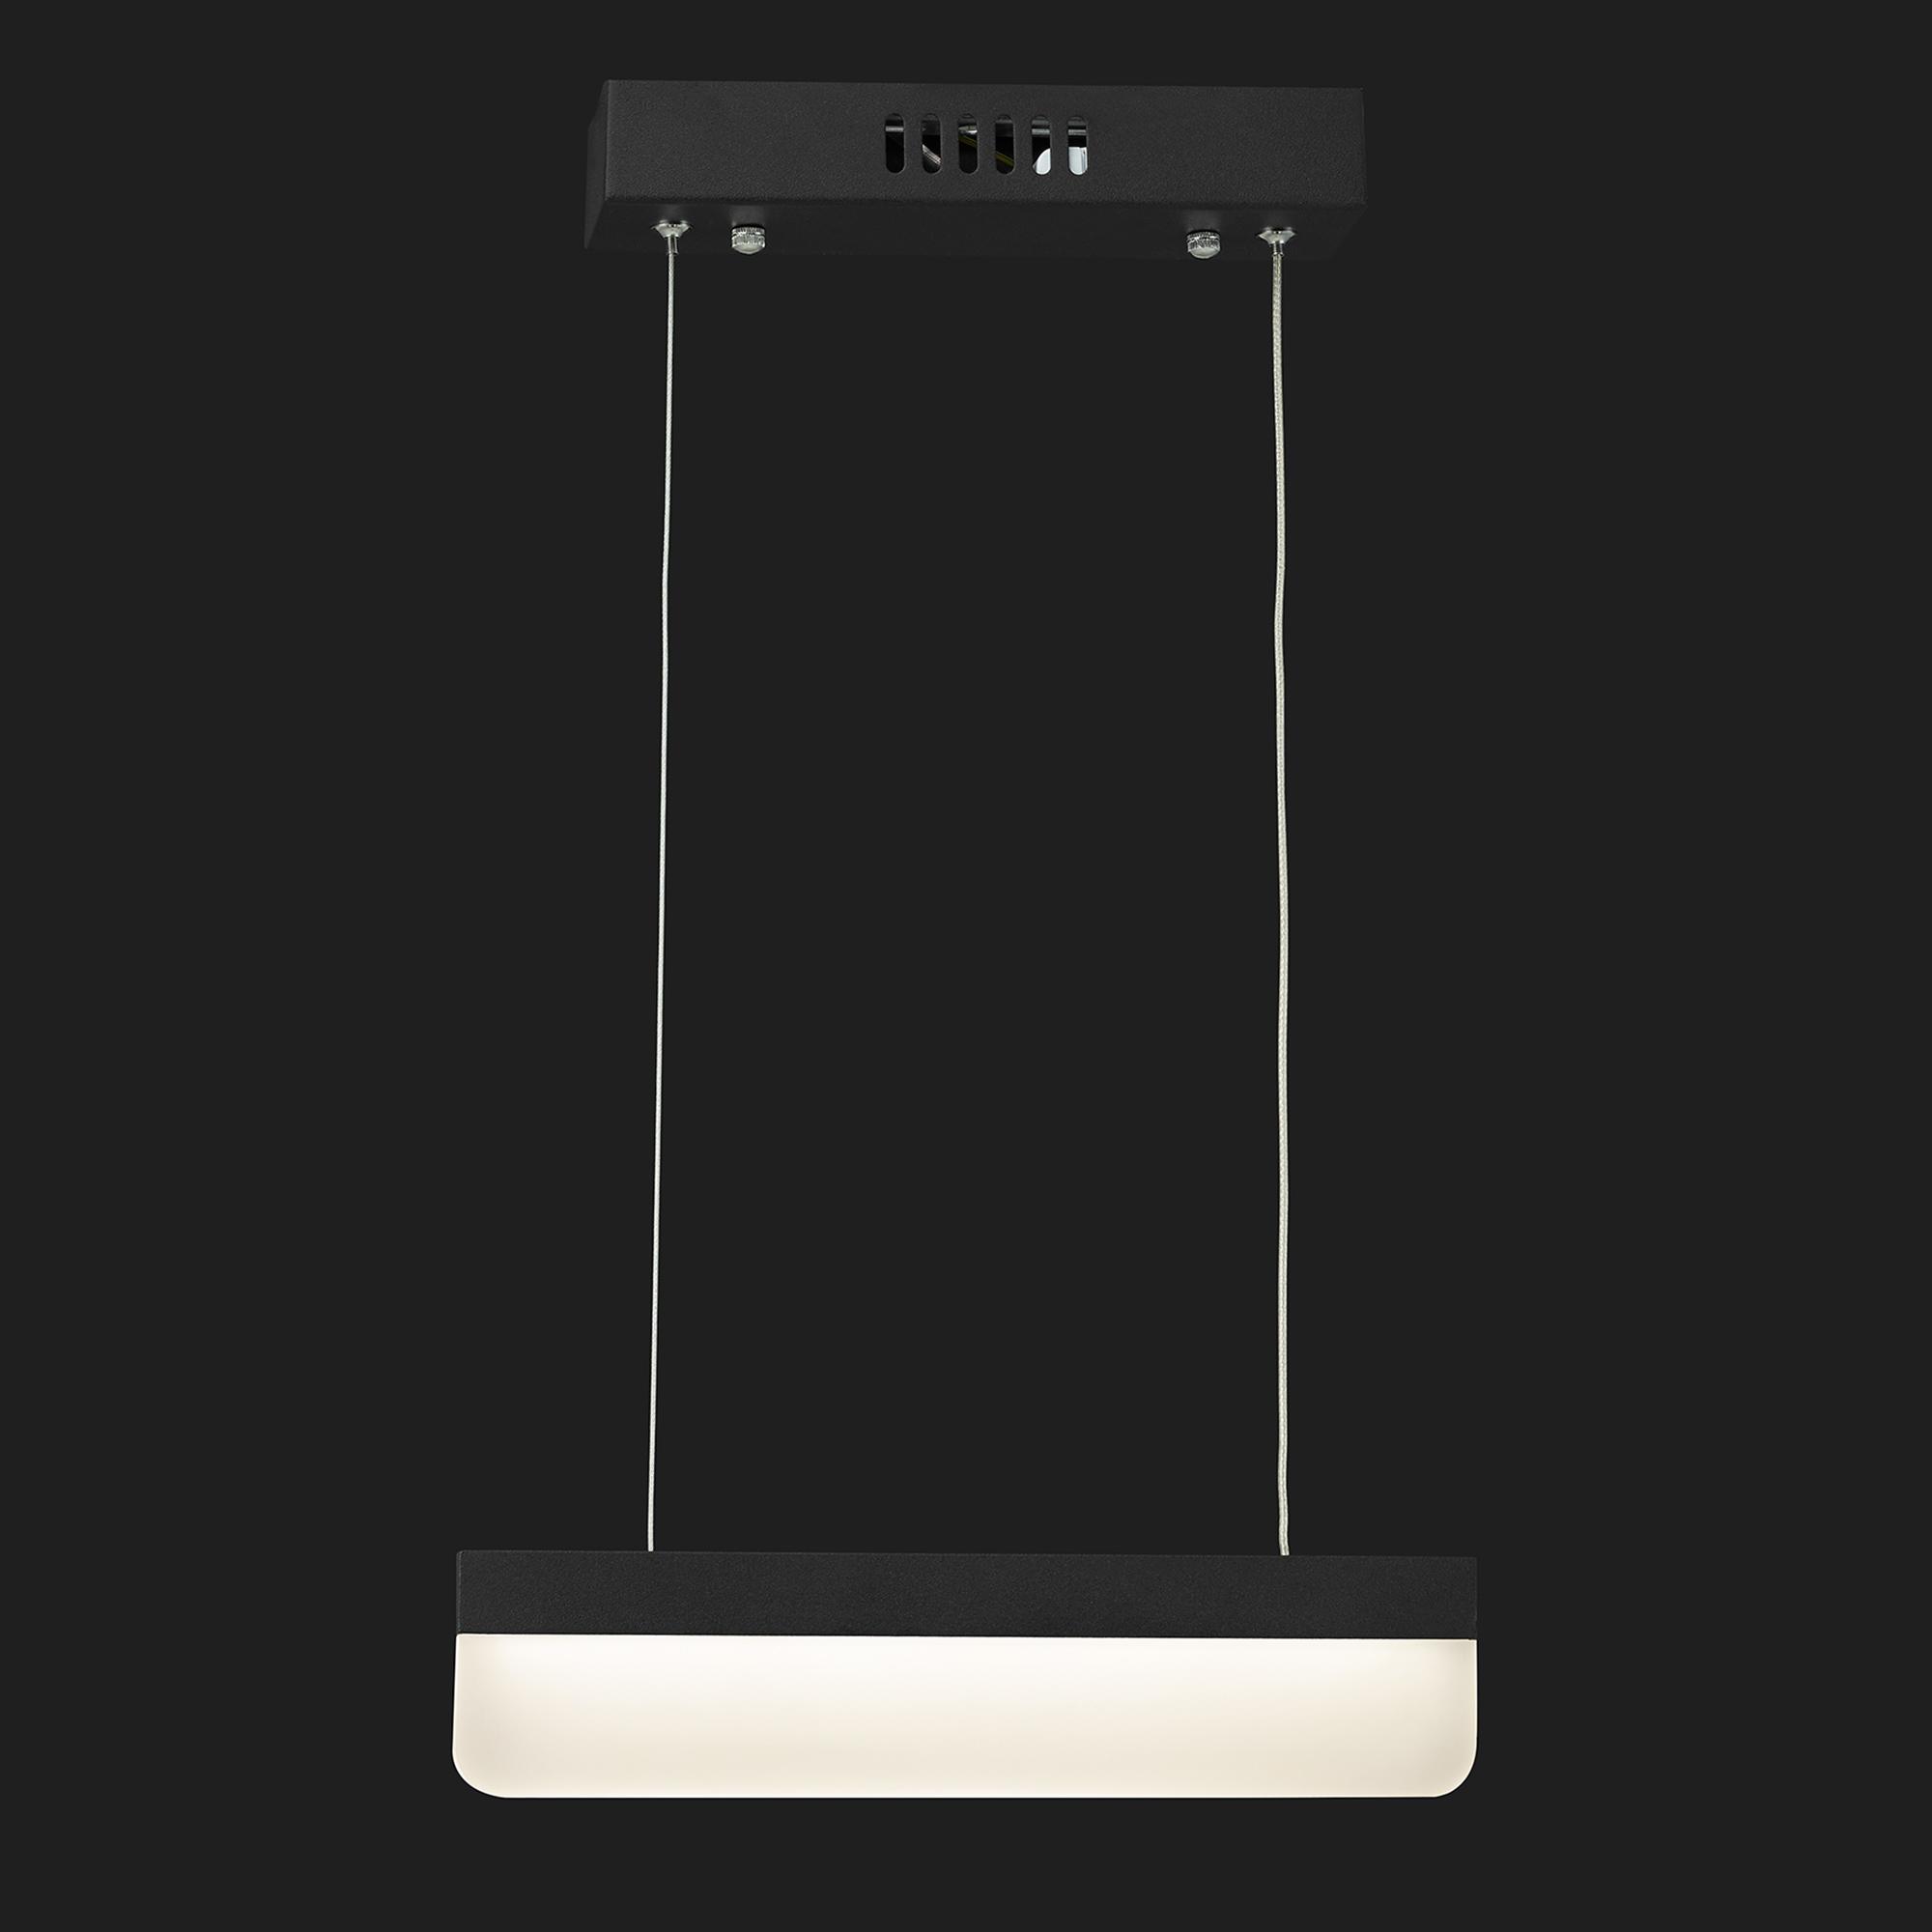 Design led lampada a sospensione cromo nero slim - Lampada led design ...